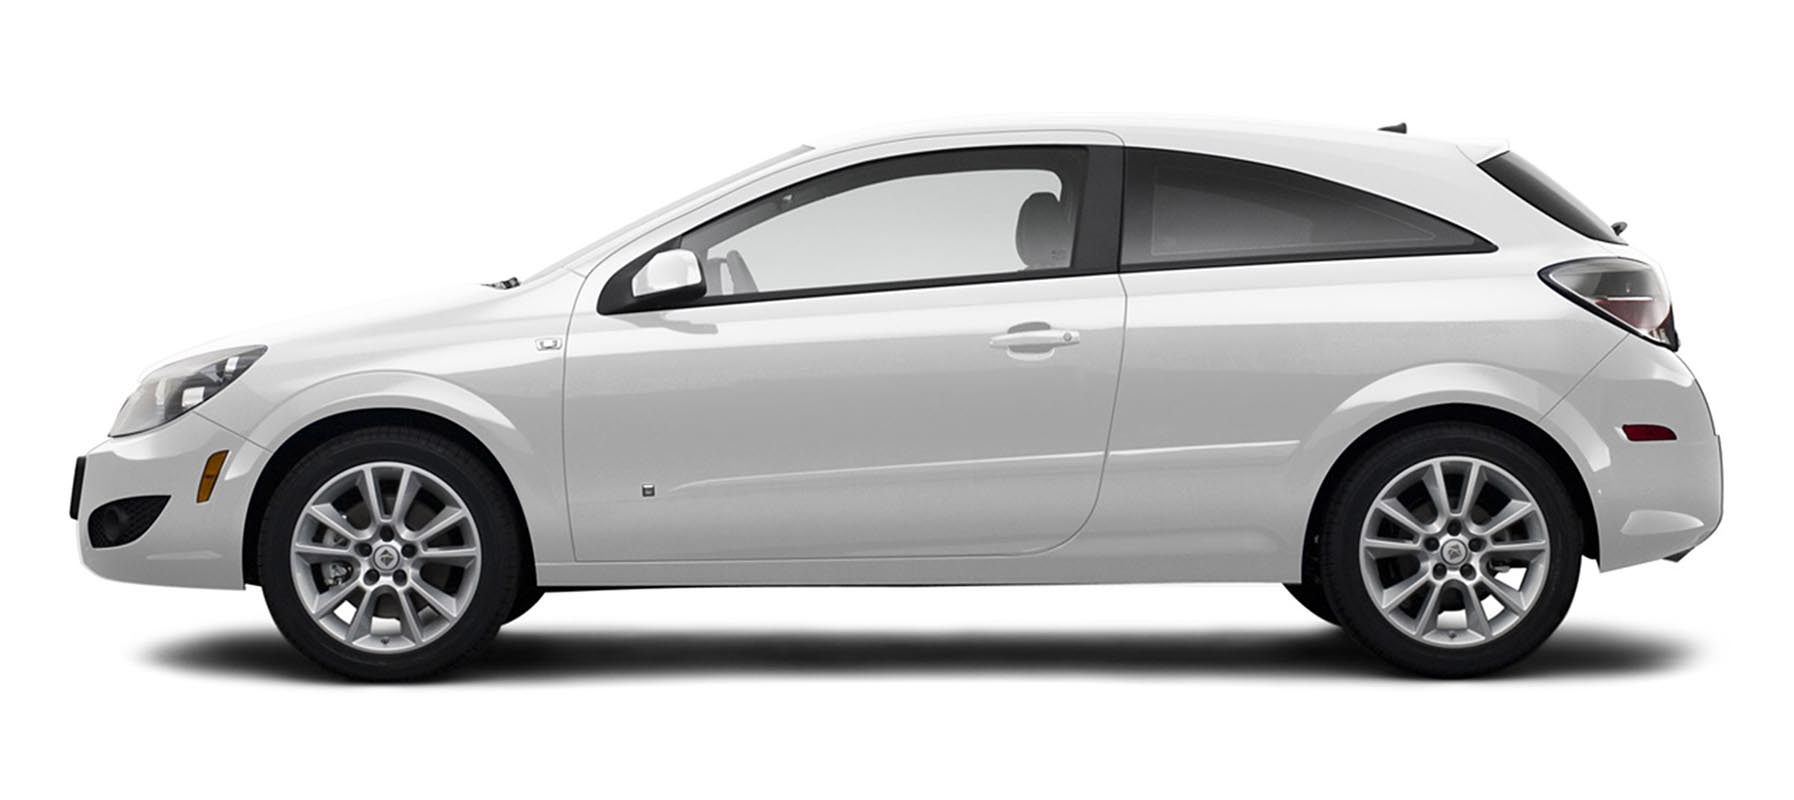 2007 Saturn Vue Electrical System Complaints 2016 Car Release Date